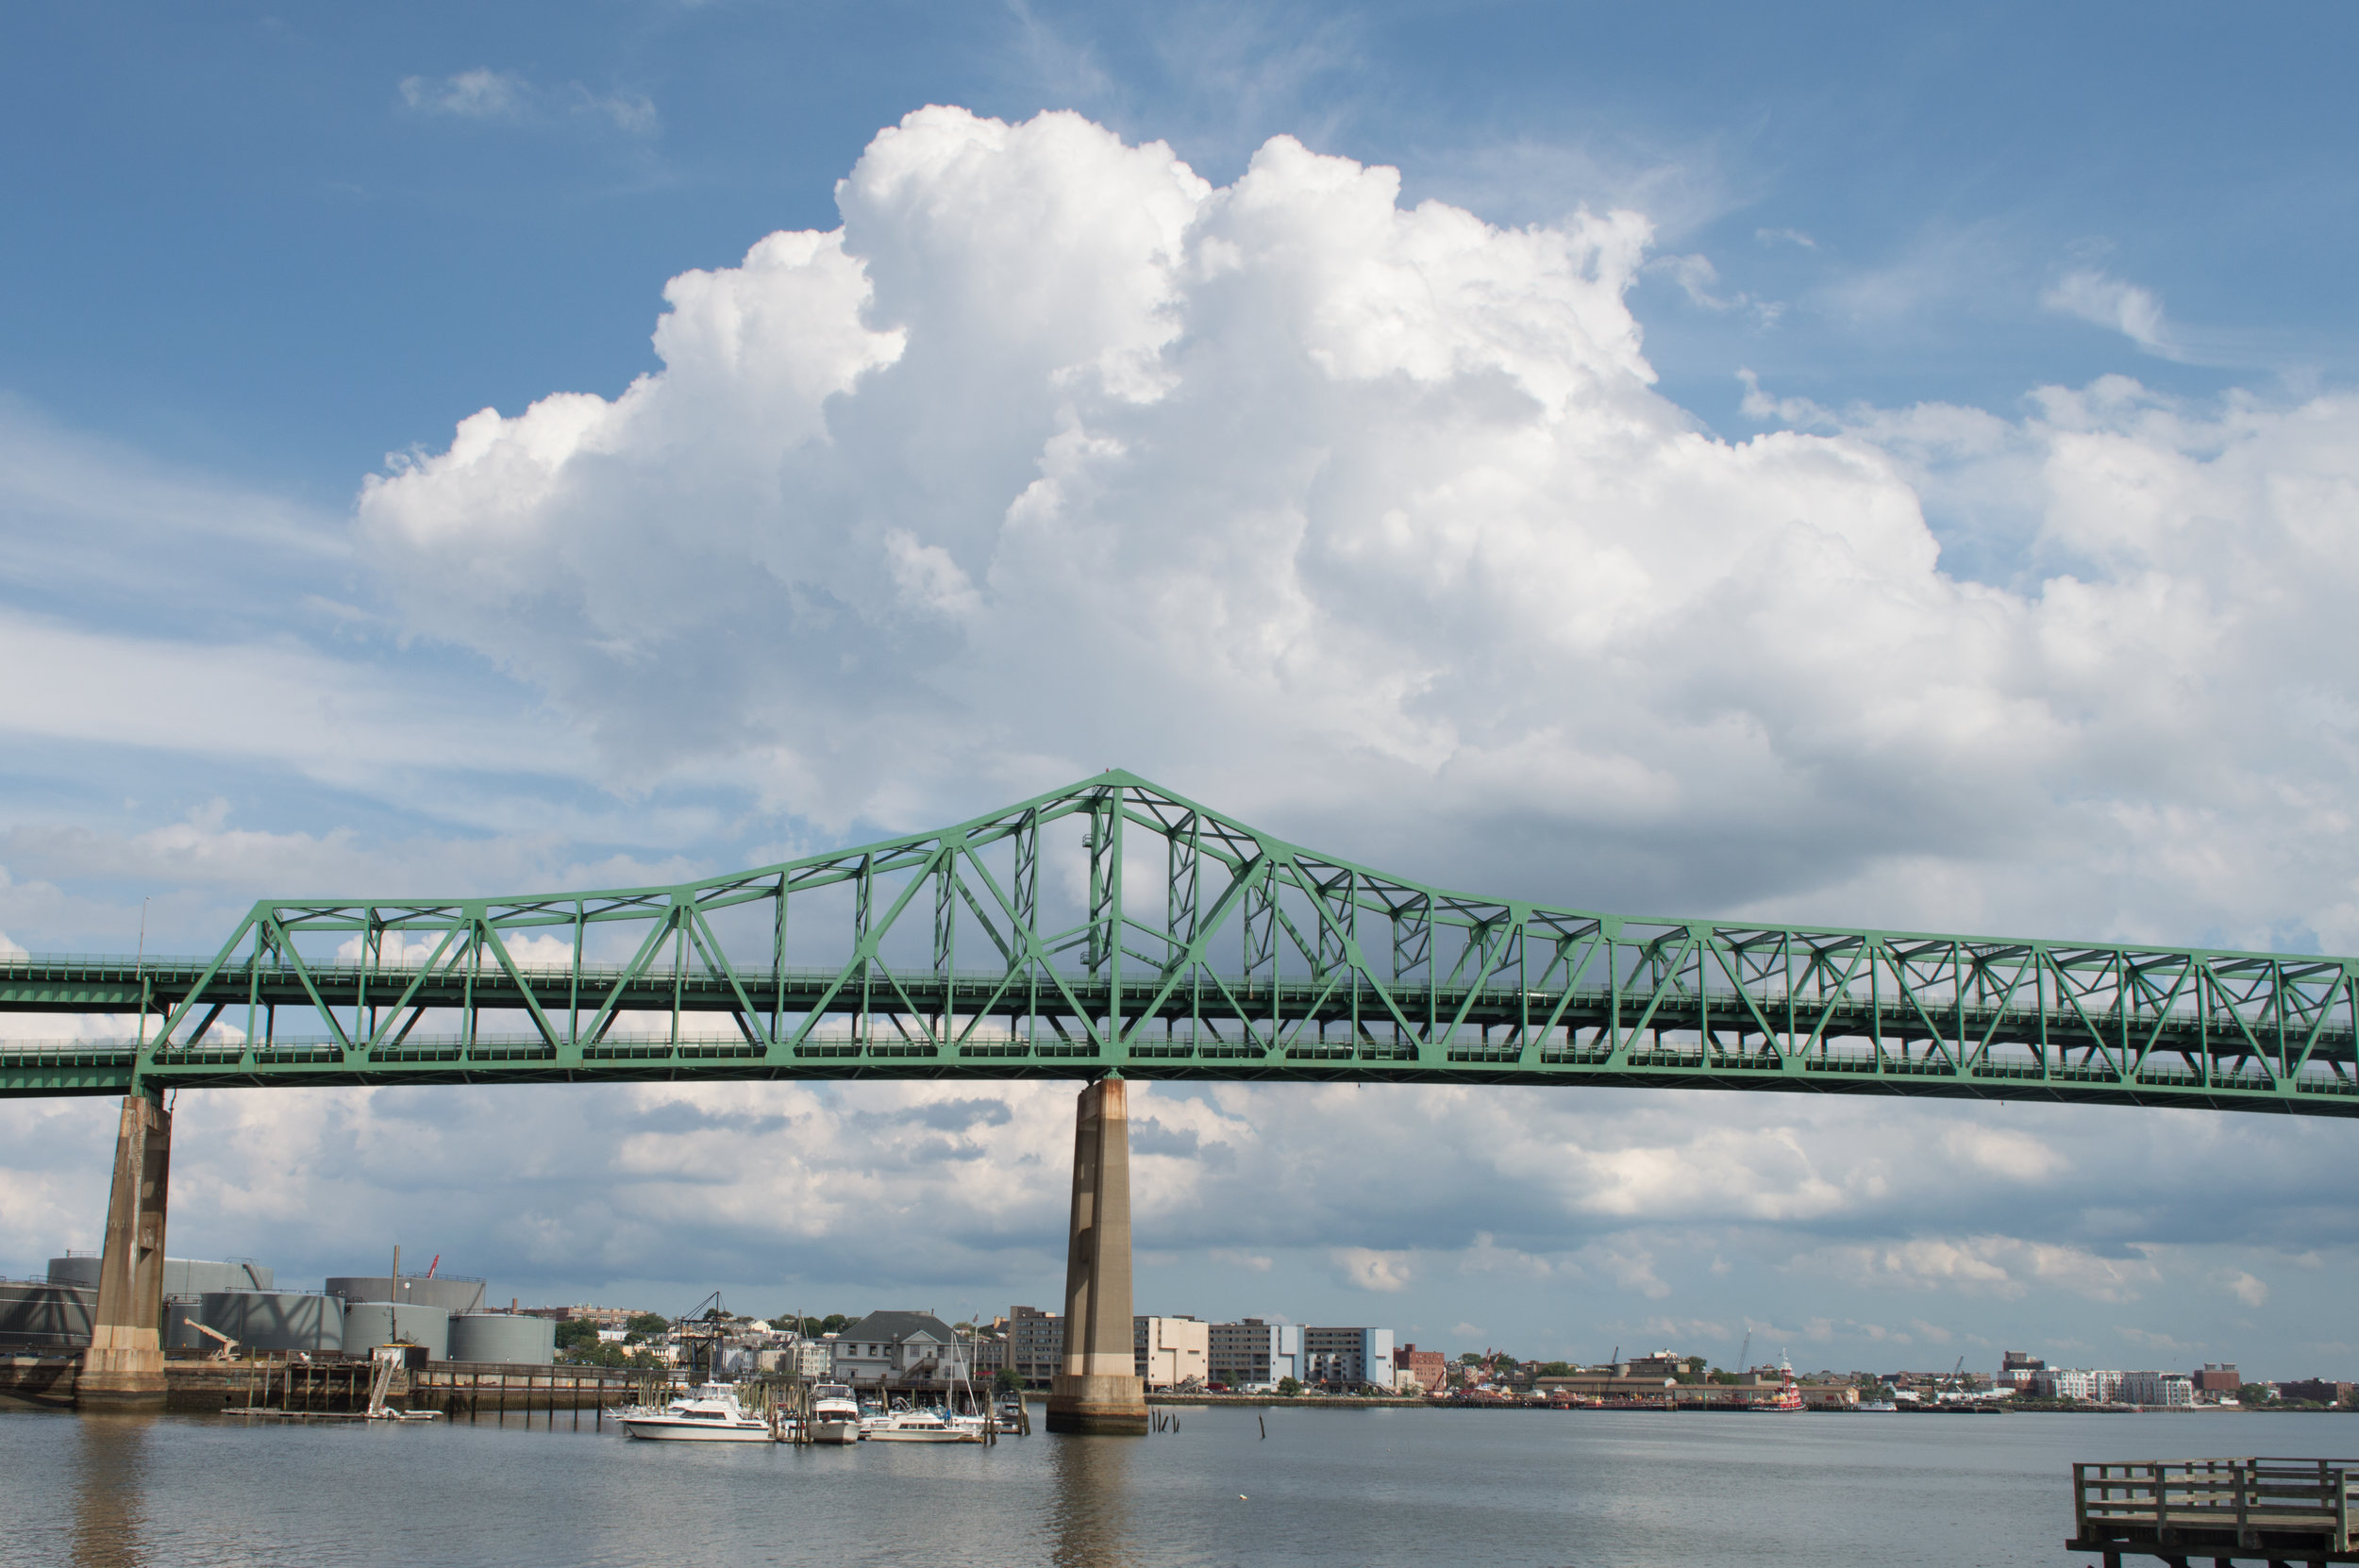 Copy of Tobin Bridge by Georgia D Green